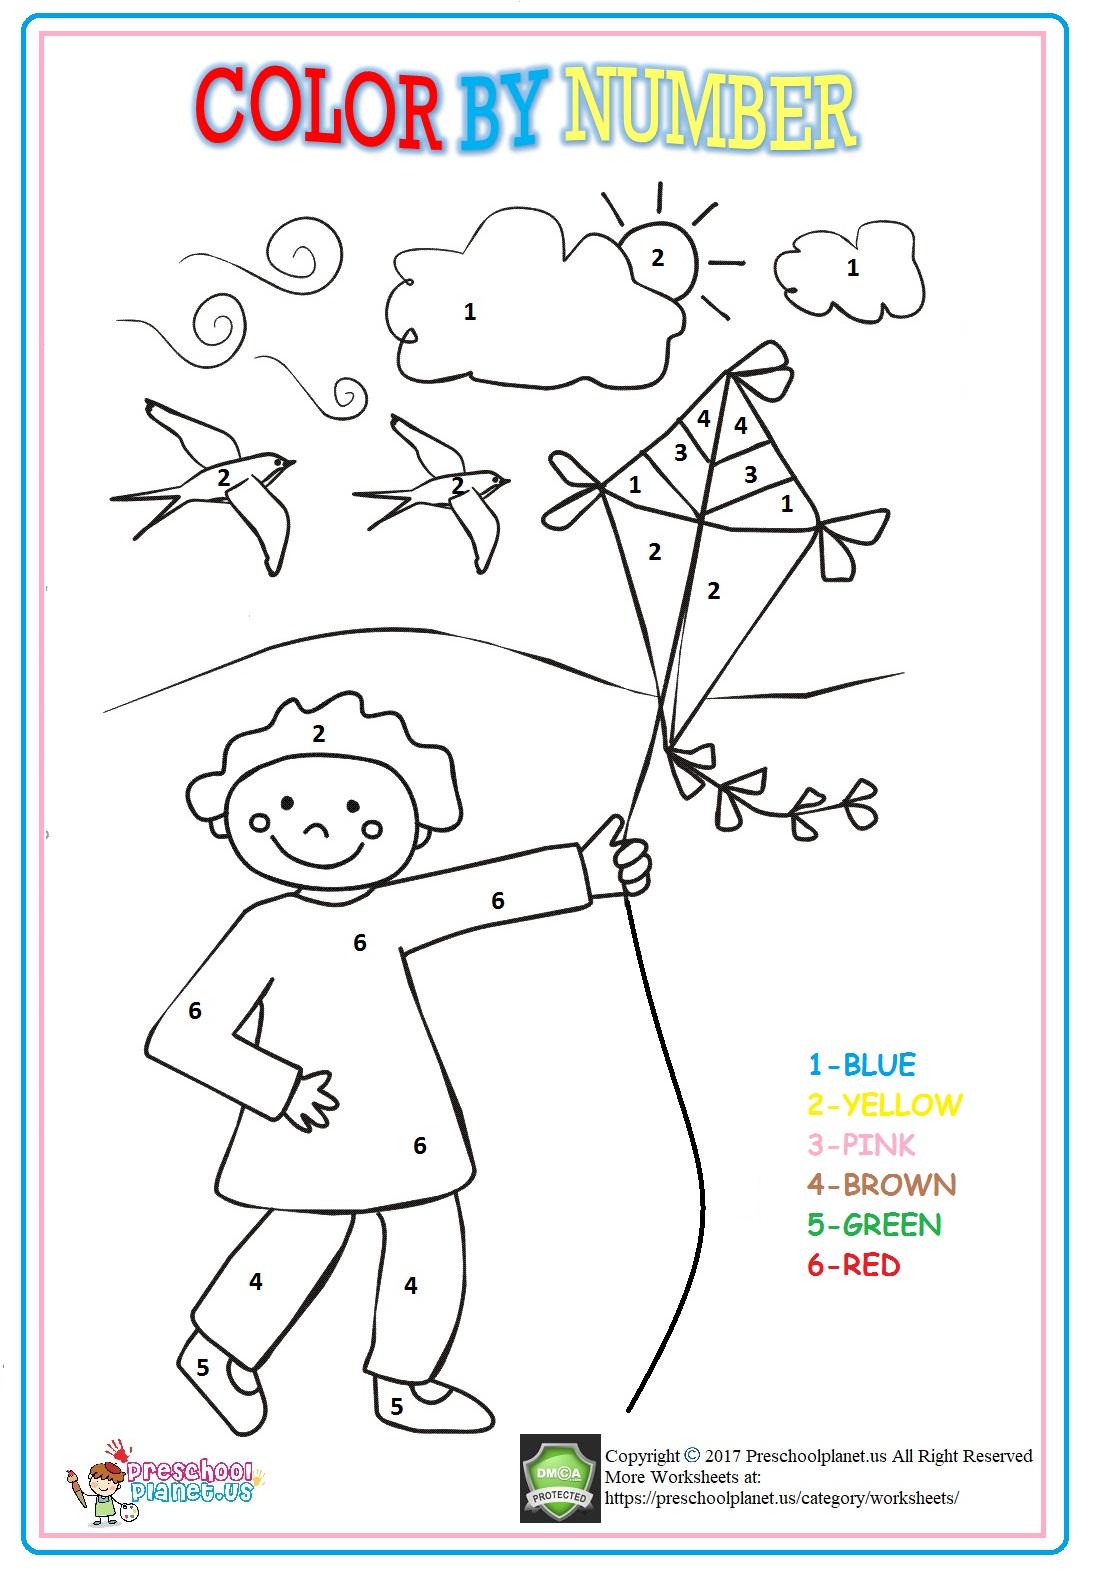 Fireman Worksheet For Kids Preschoolplanet